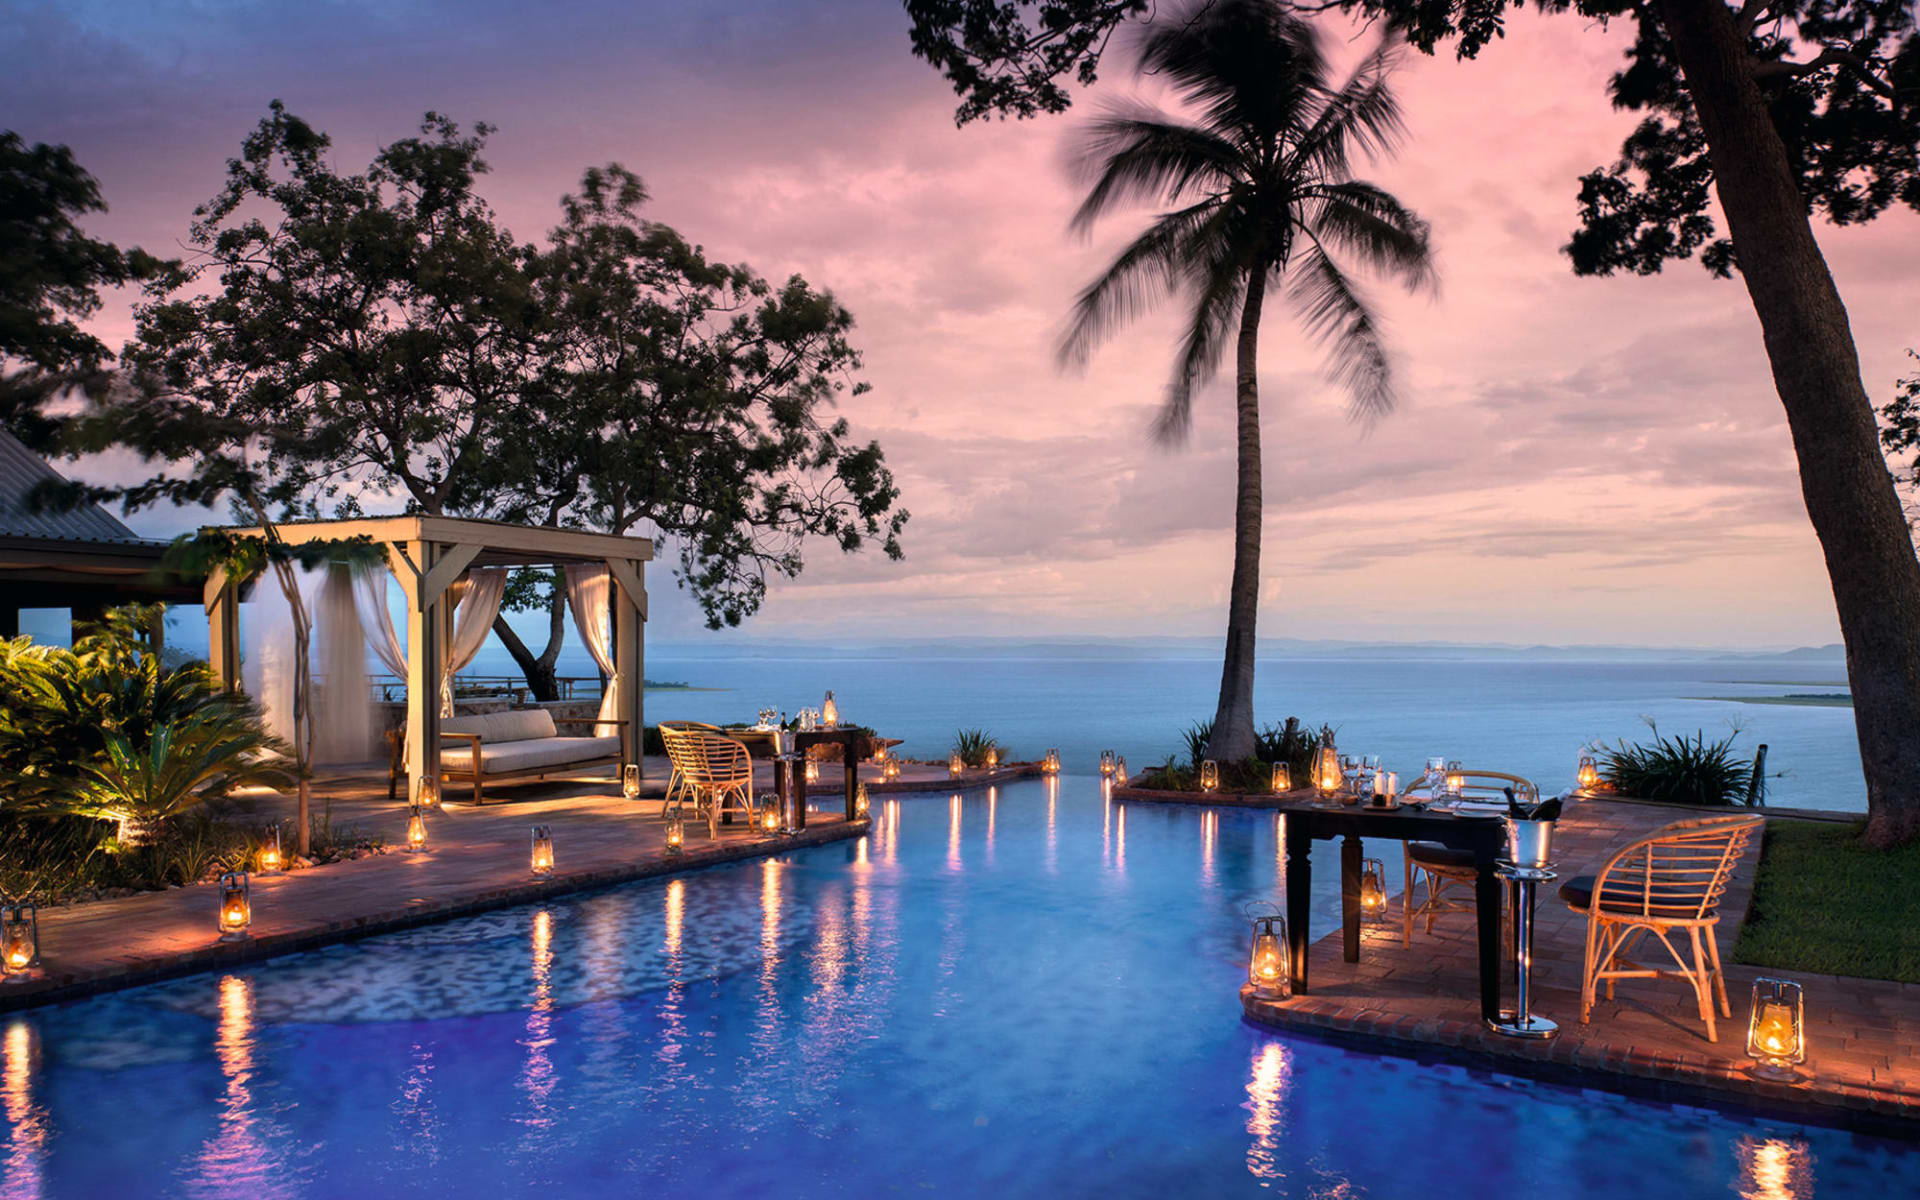 Bumi Hills Safari Lodge in Kariba: 10_facilities Bumi Hills -Swimmingpool bei D�mmerun gmit Blick auf Lake Karibe c African Bush Camps